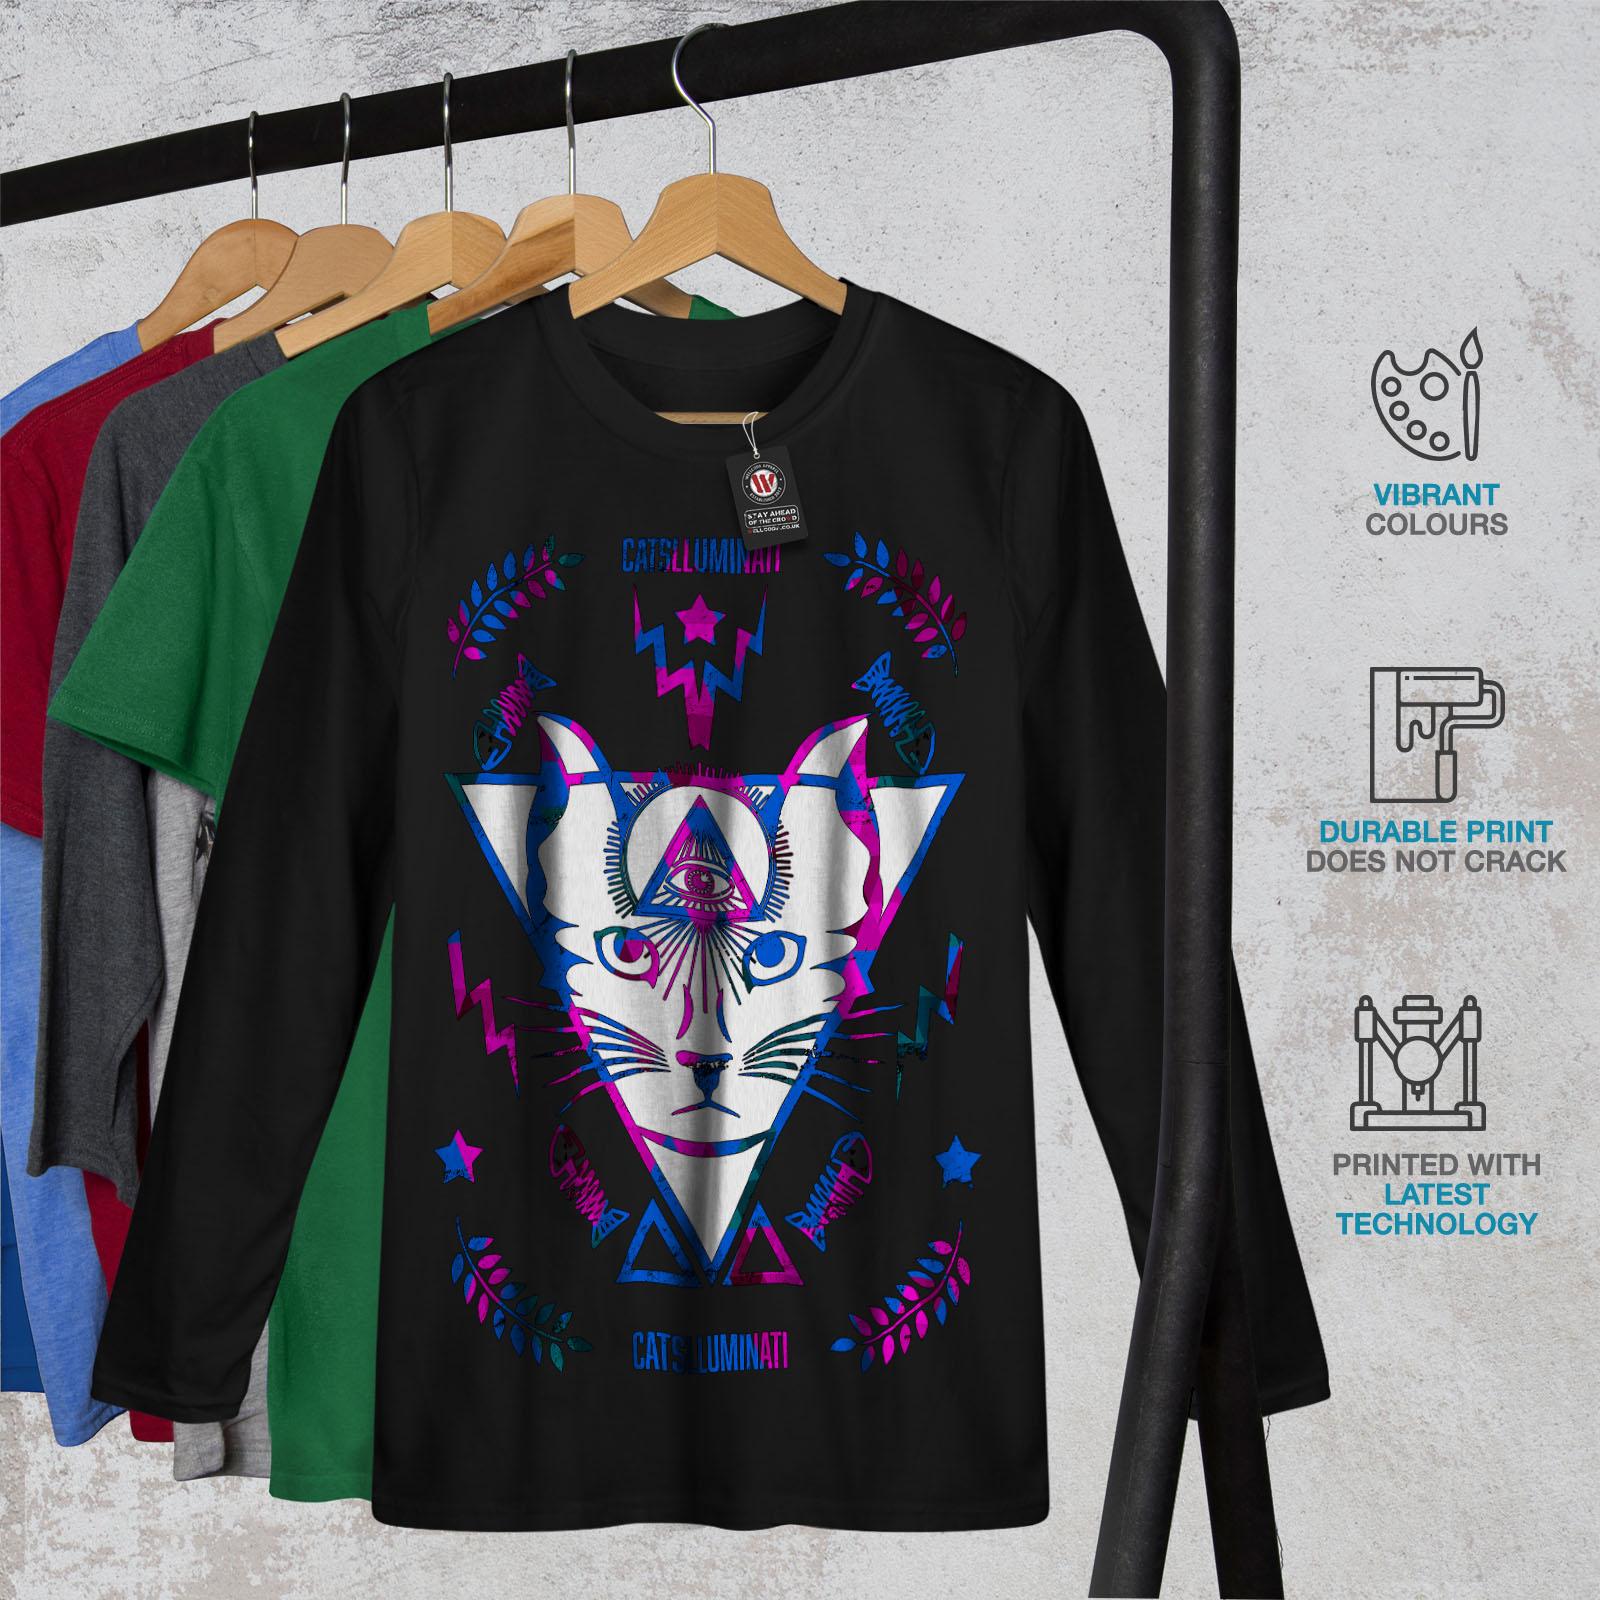 Whisker Graphic Design Printed Tee Wellcoda Cat Triangle Magic Mens T-shirt